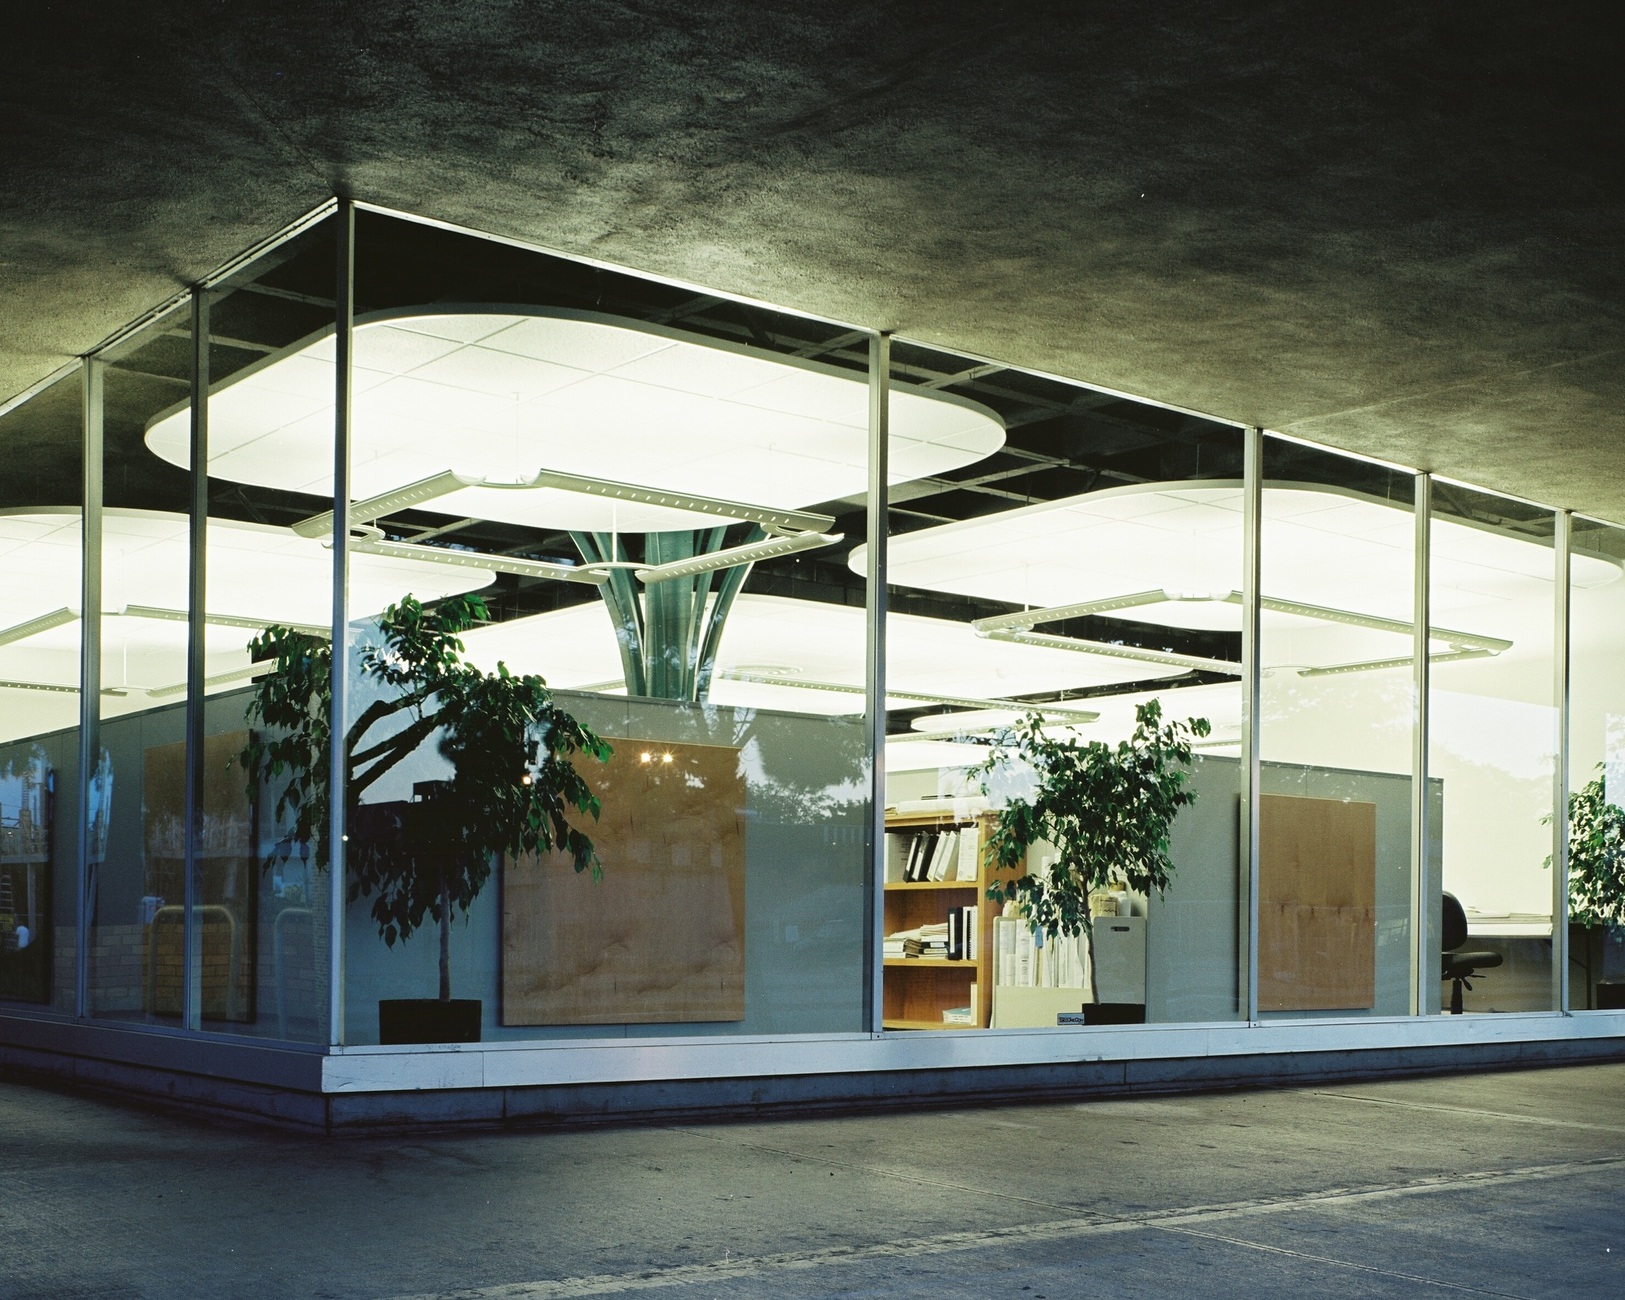 Balzhiser & Hubbard Engineers Office